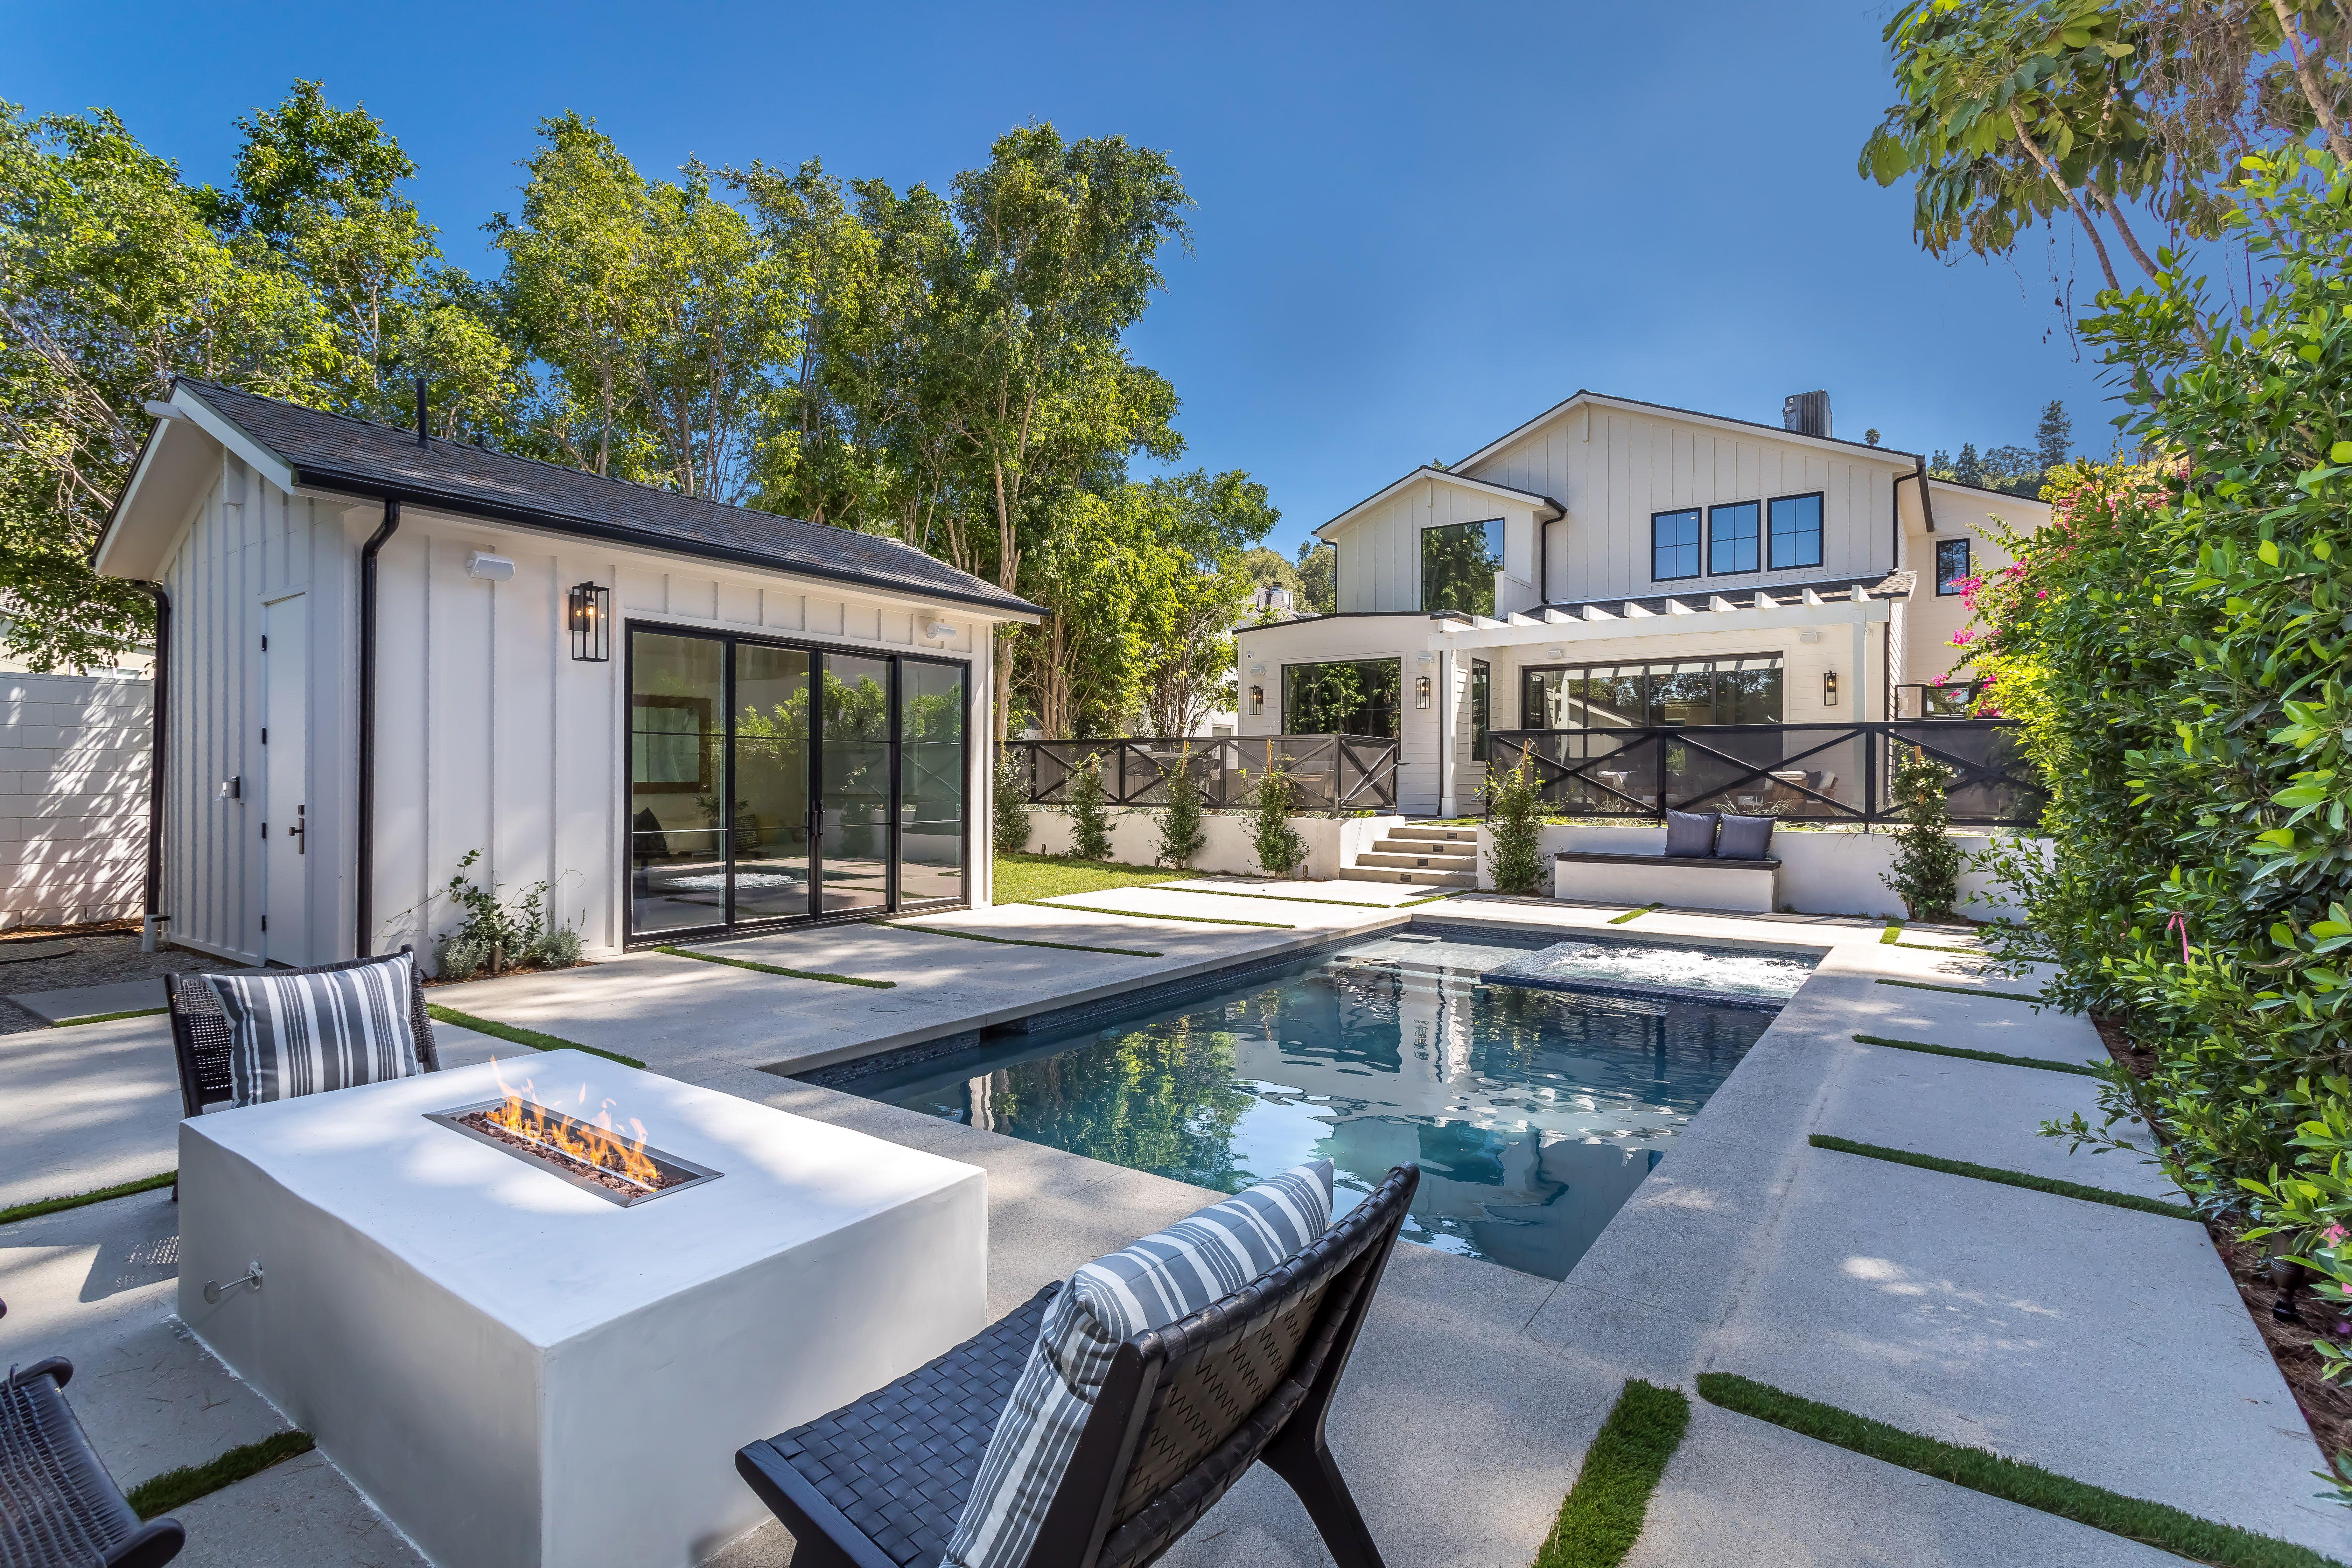 15125 Valley Vista Blvd Sherman Oaks Ca 91403 In 2020 Oaks House California Homes Dream House